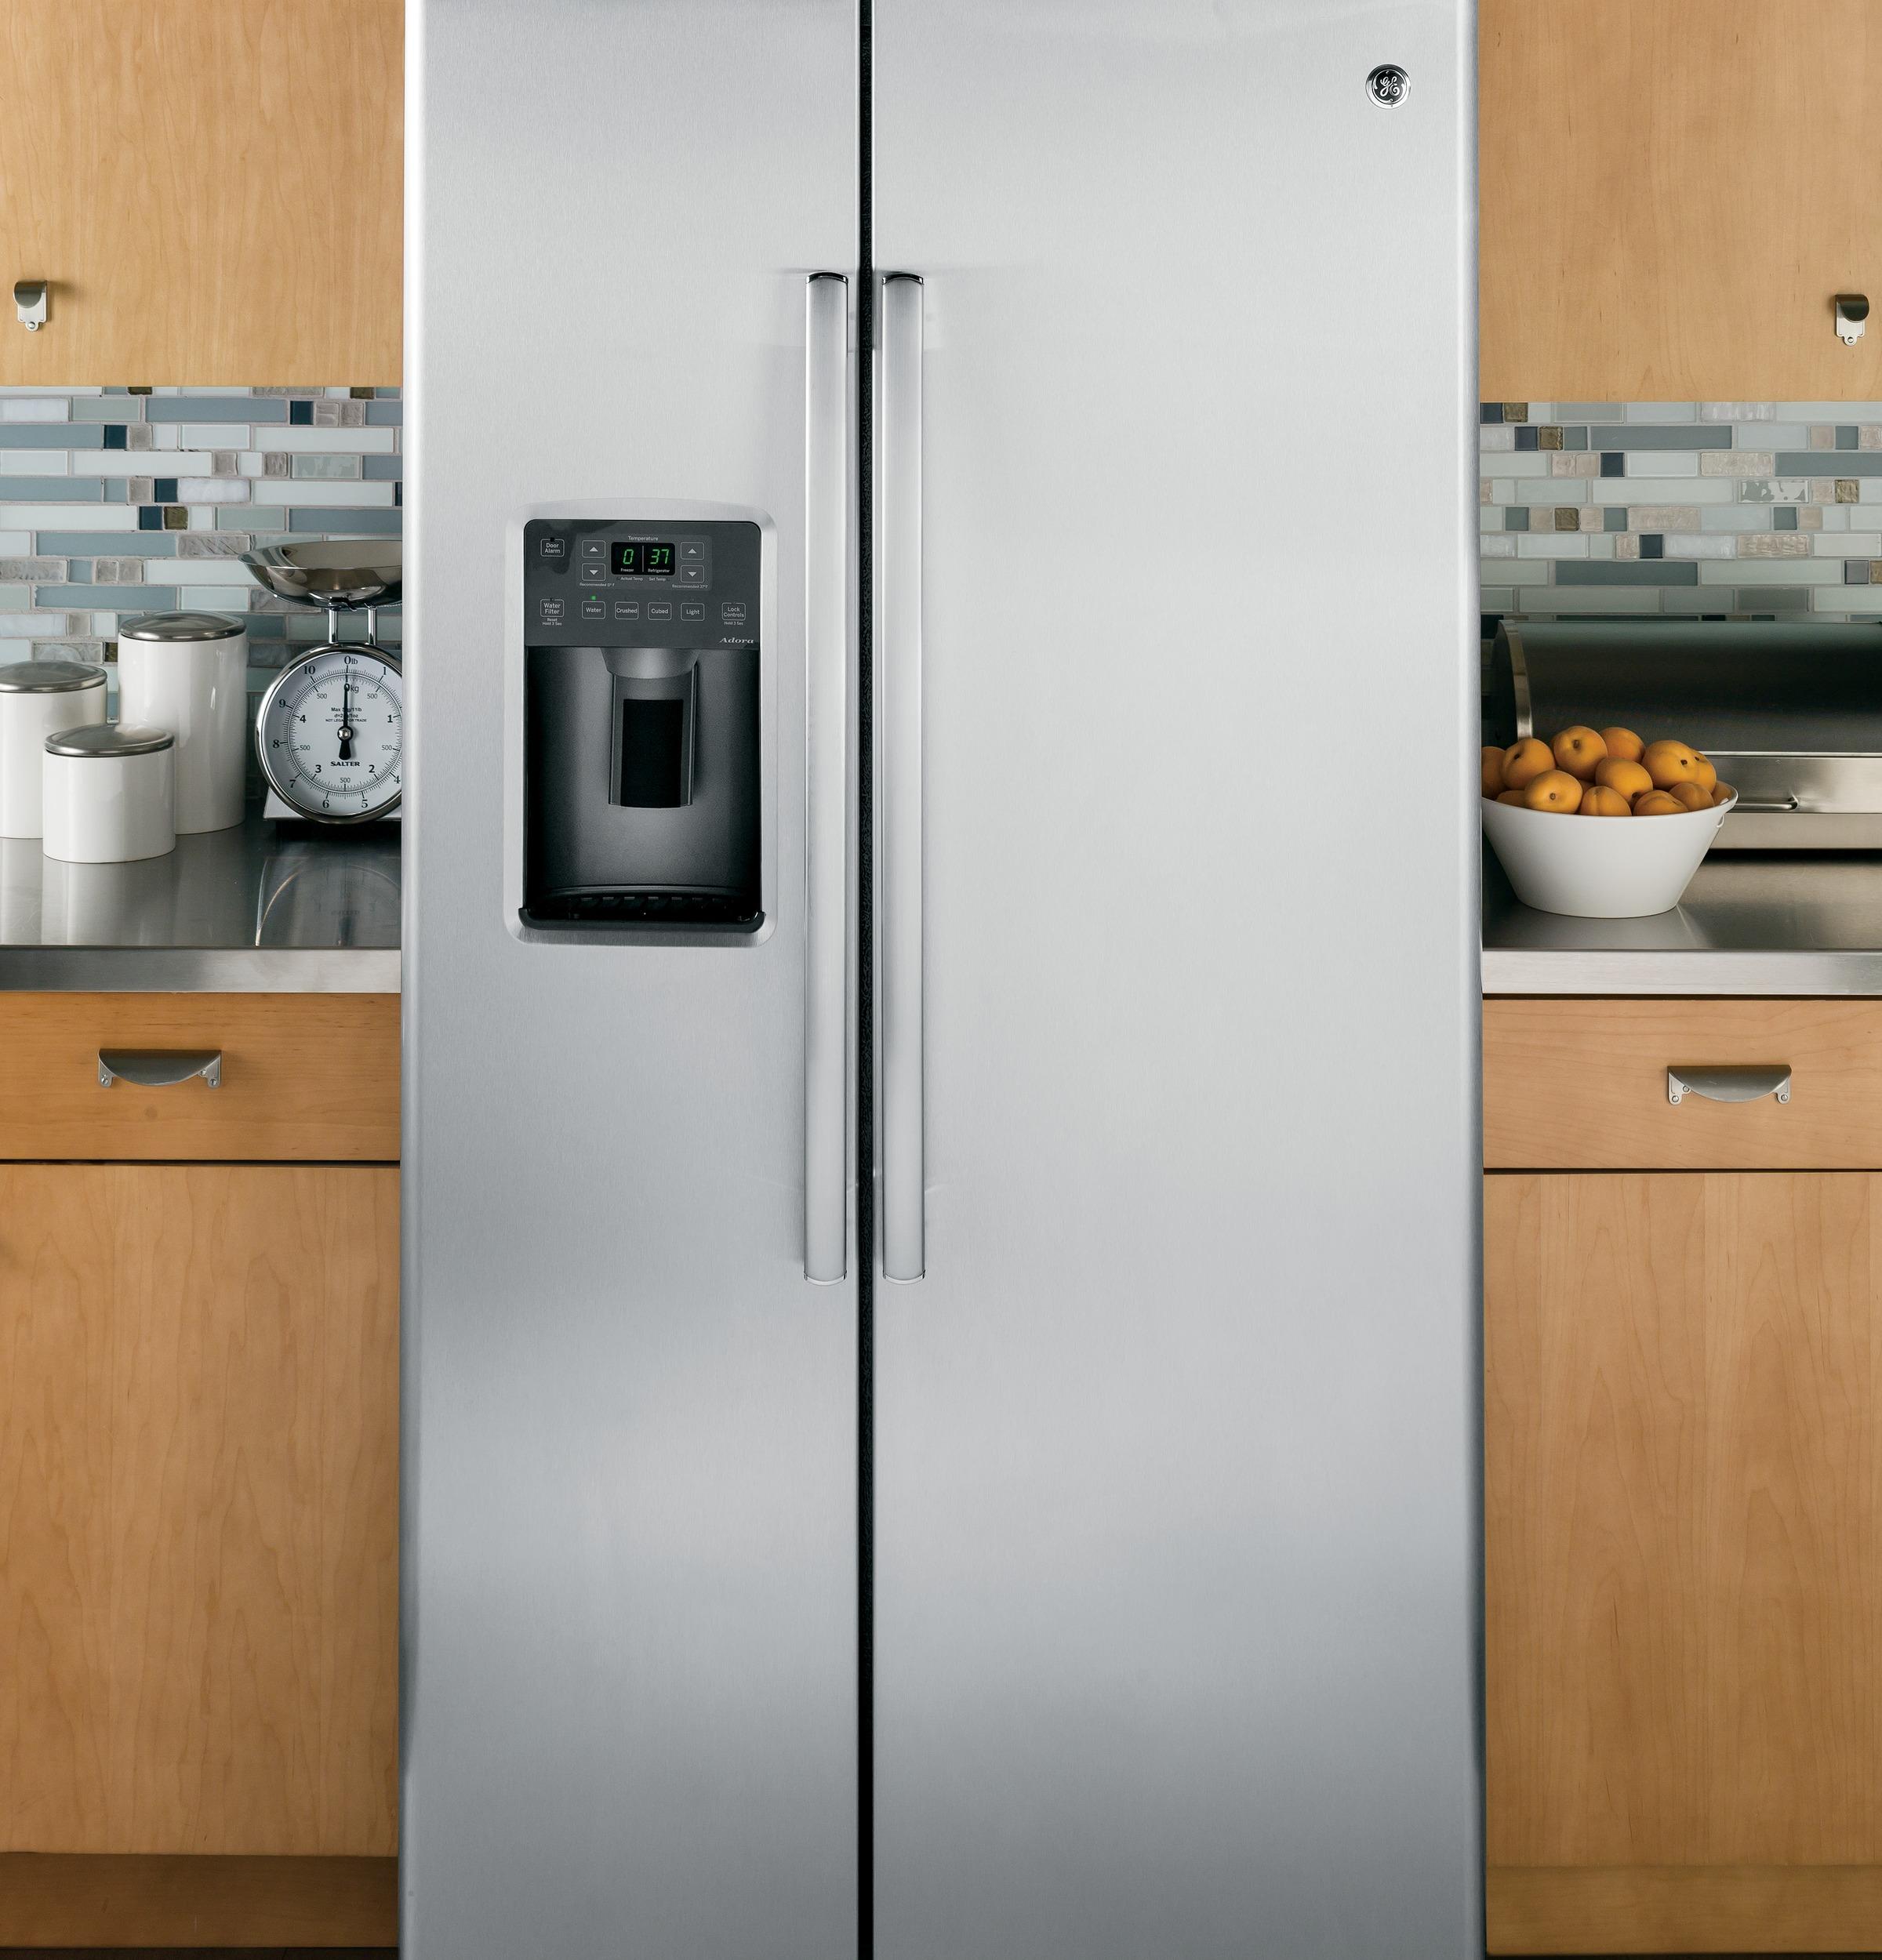 GE Appliances GSS25GSHSS 25.4 cu. ft. Side-By-Side Refrigerator - Stainless Steel